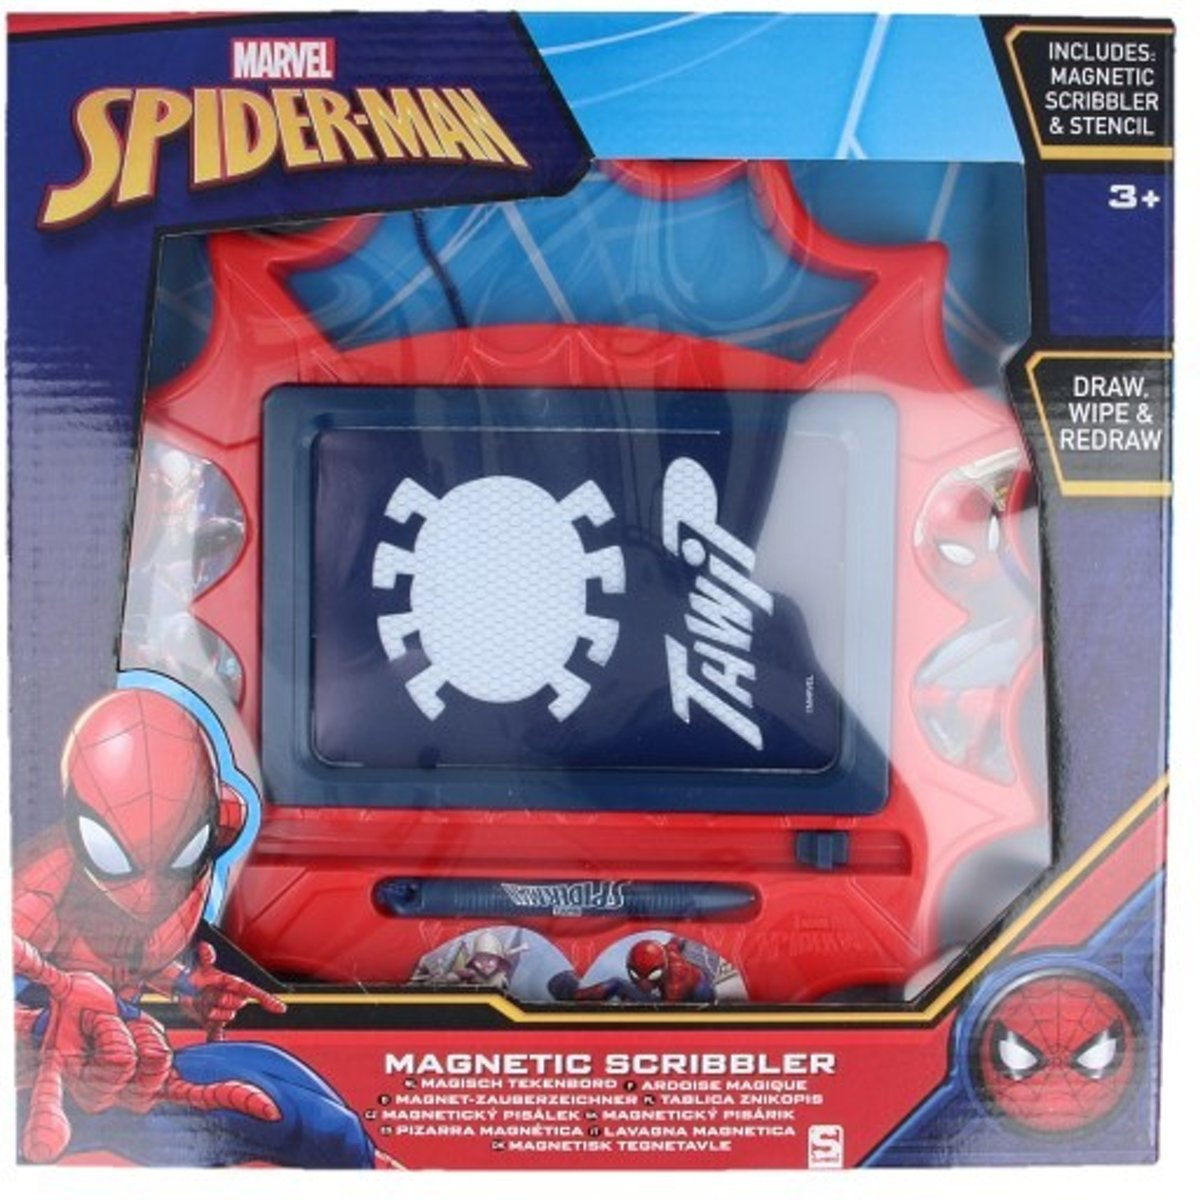 Magnetisch Tekenbord Spiderman